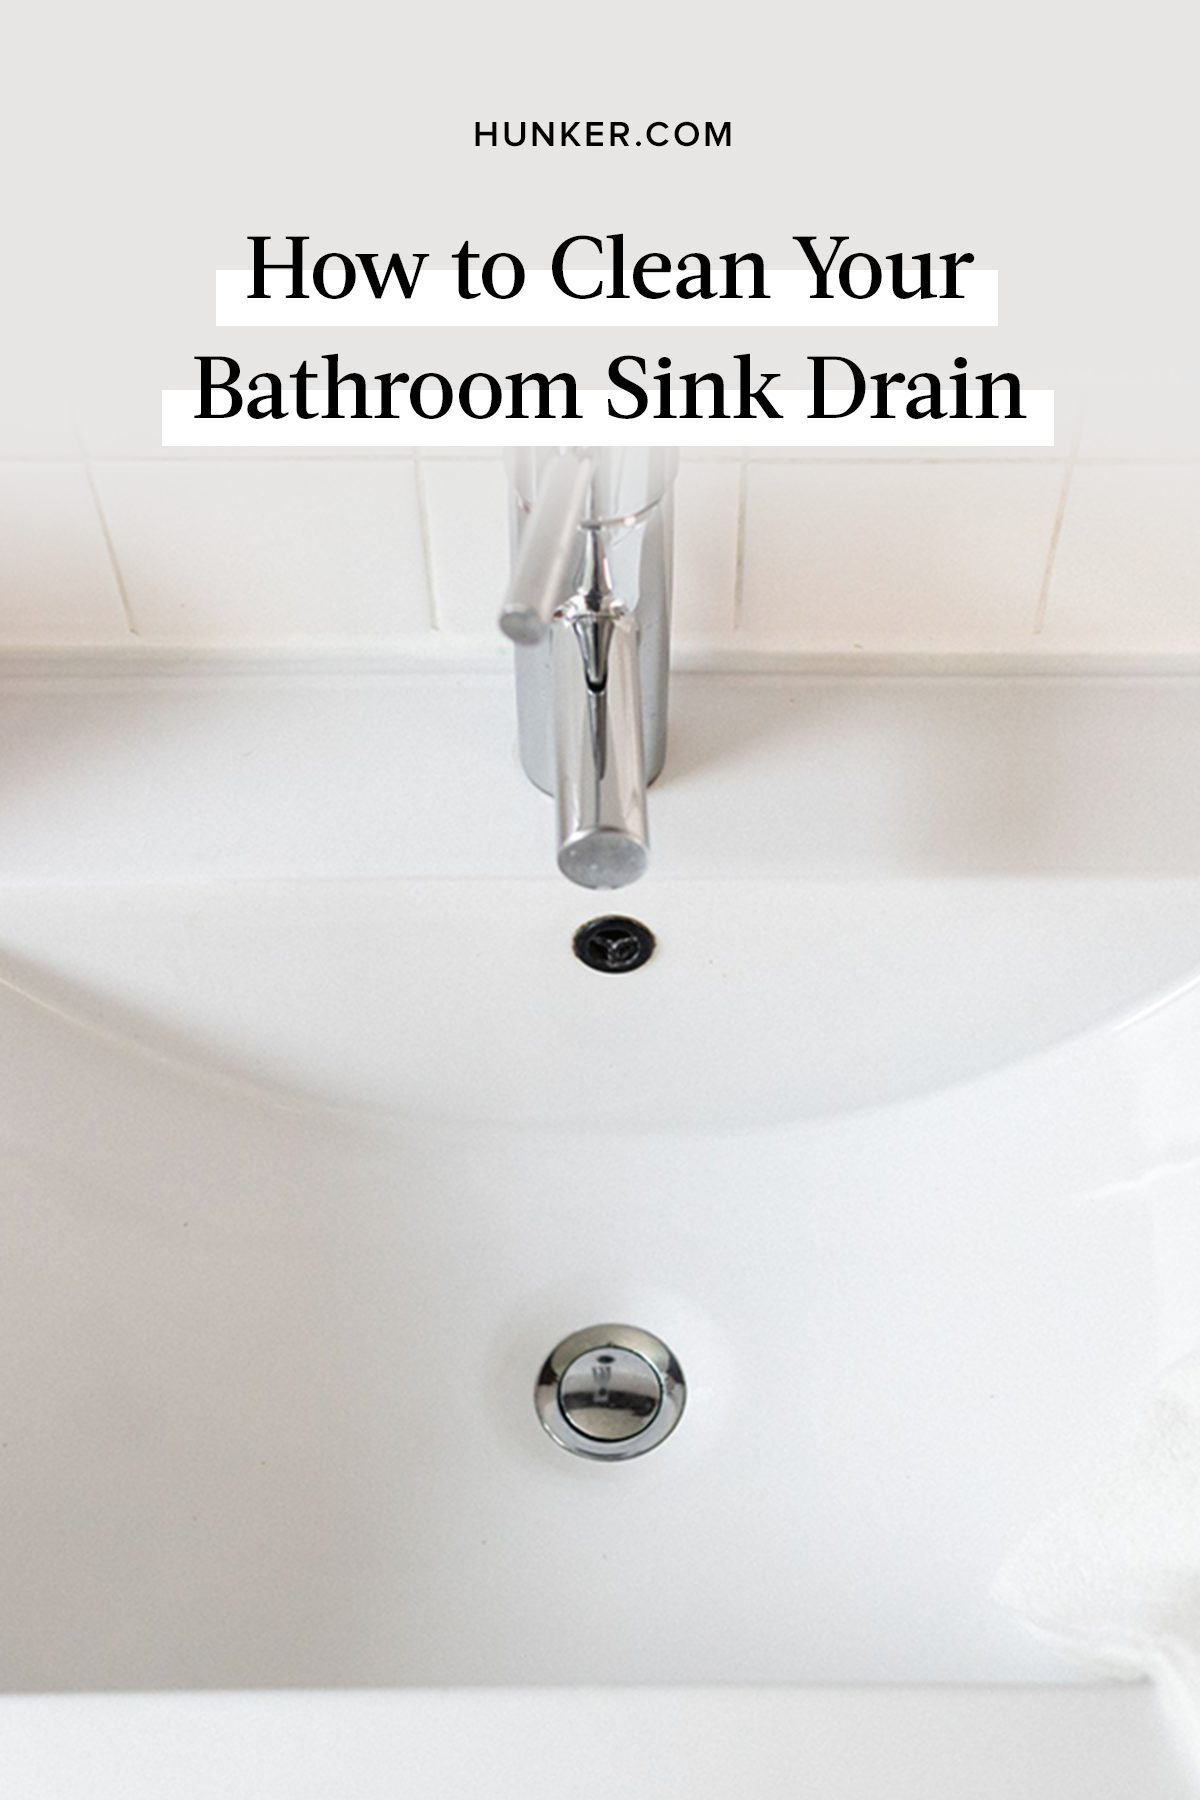 Got A Bathroom Sink Drain That Smells Here S How To Clean Hunker Sink Drain Bathroom Sink Drain Sink